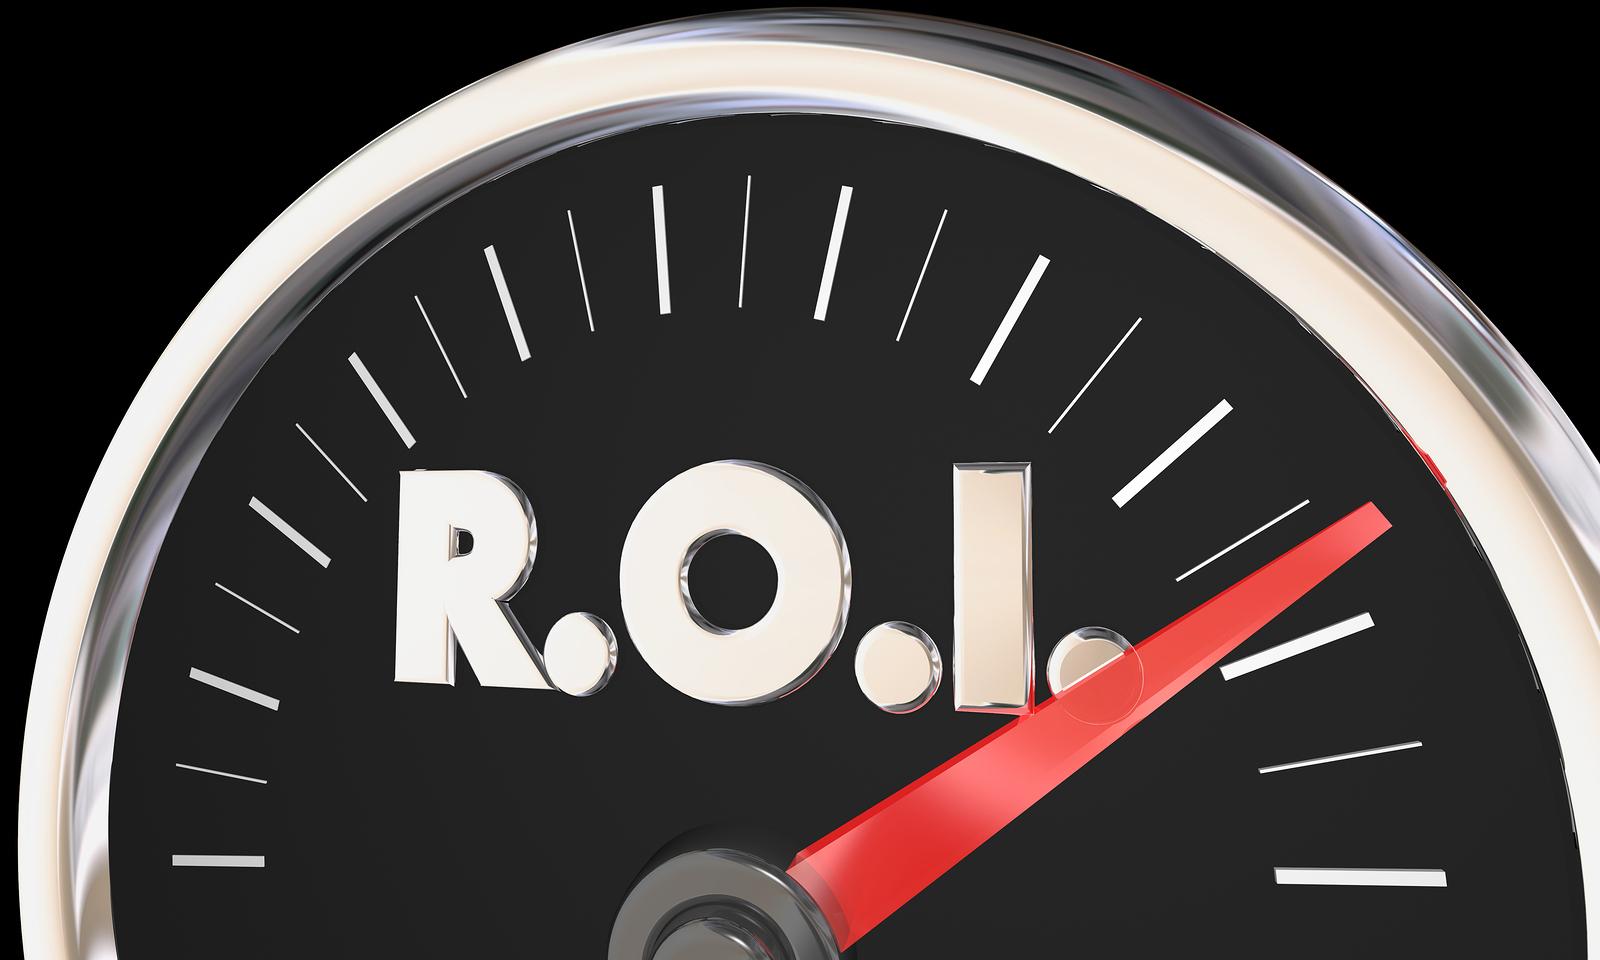 direct mail optimization calculator and speedometer gauge.